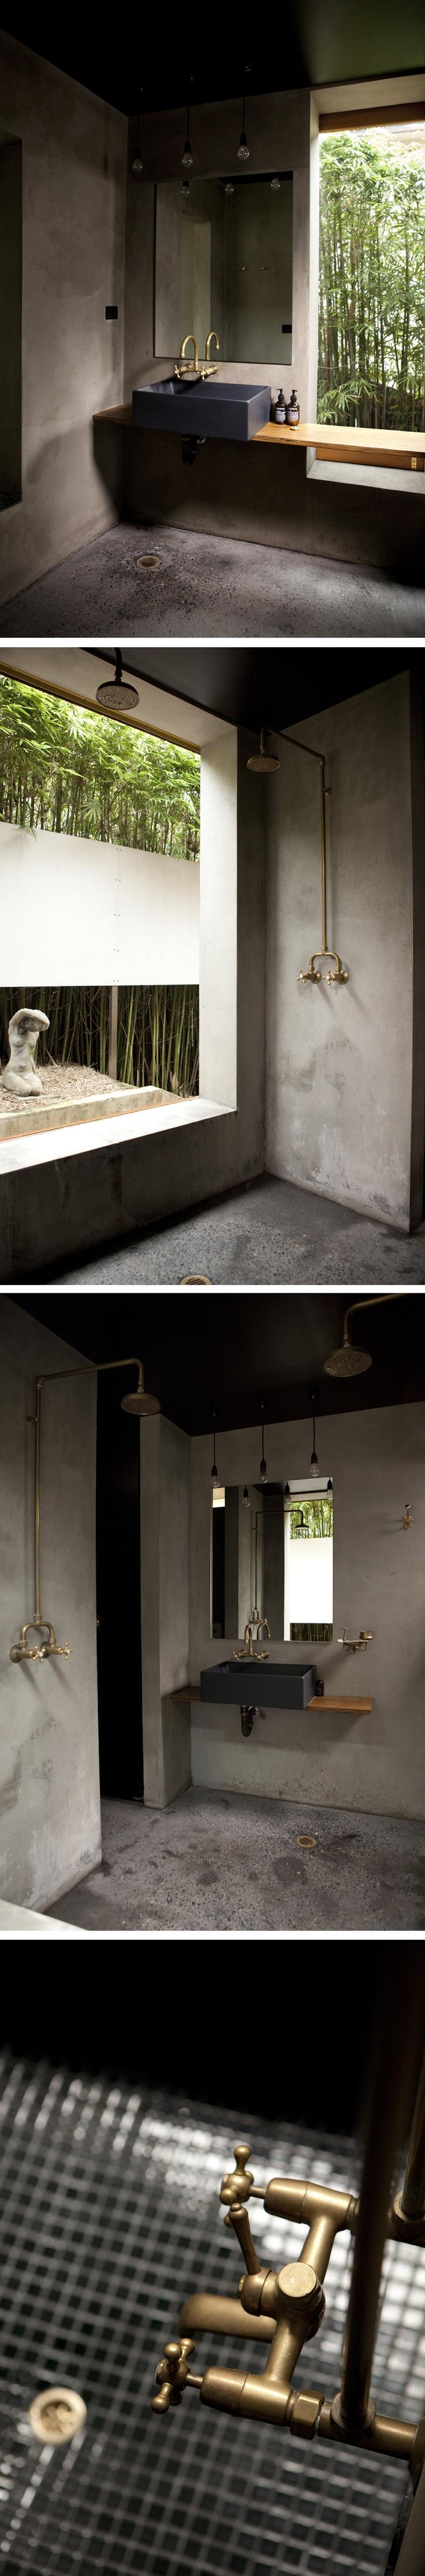 decoración-de-baño-Tarragona-9 (1)